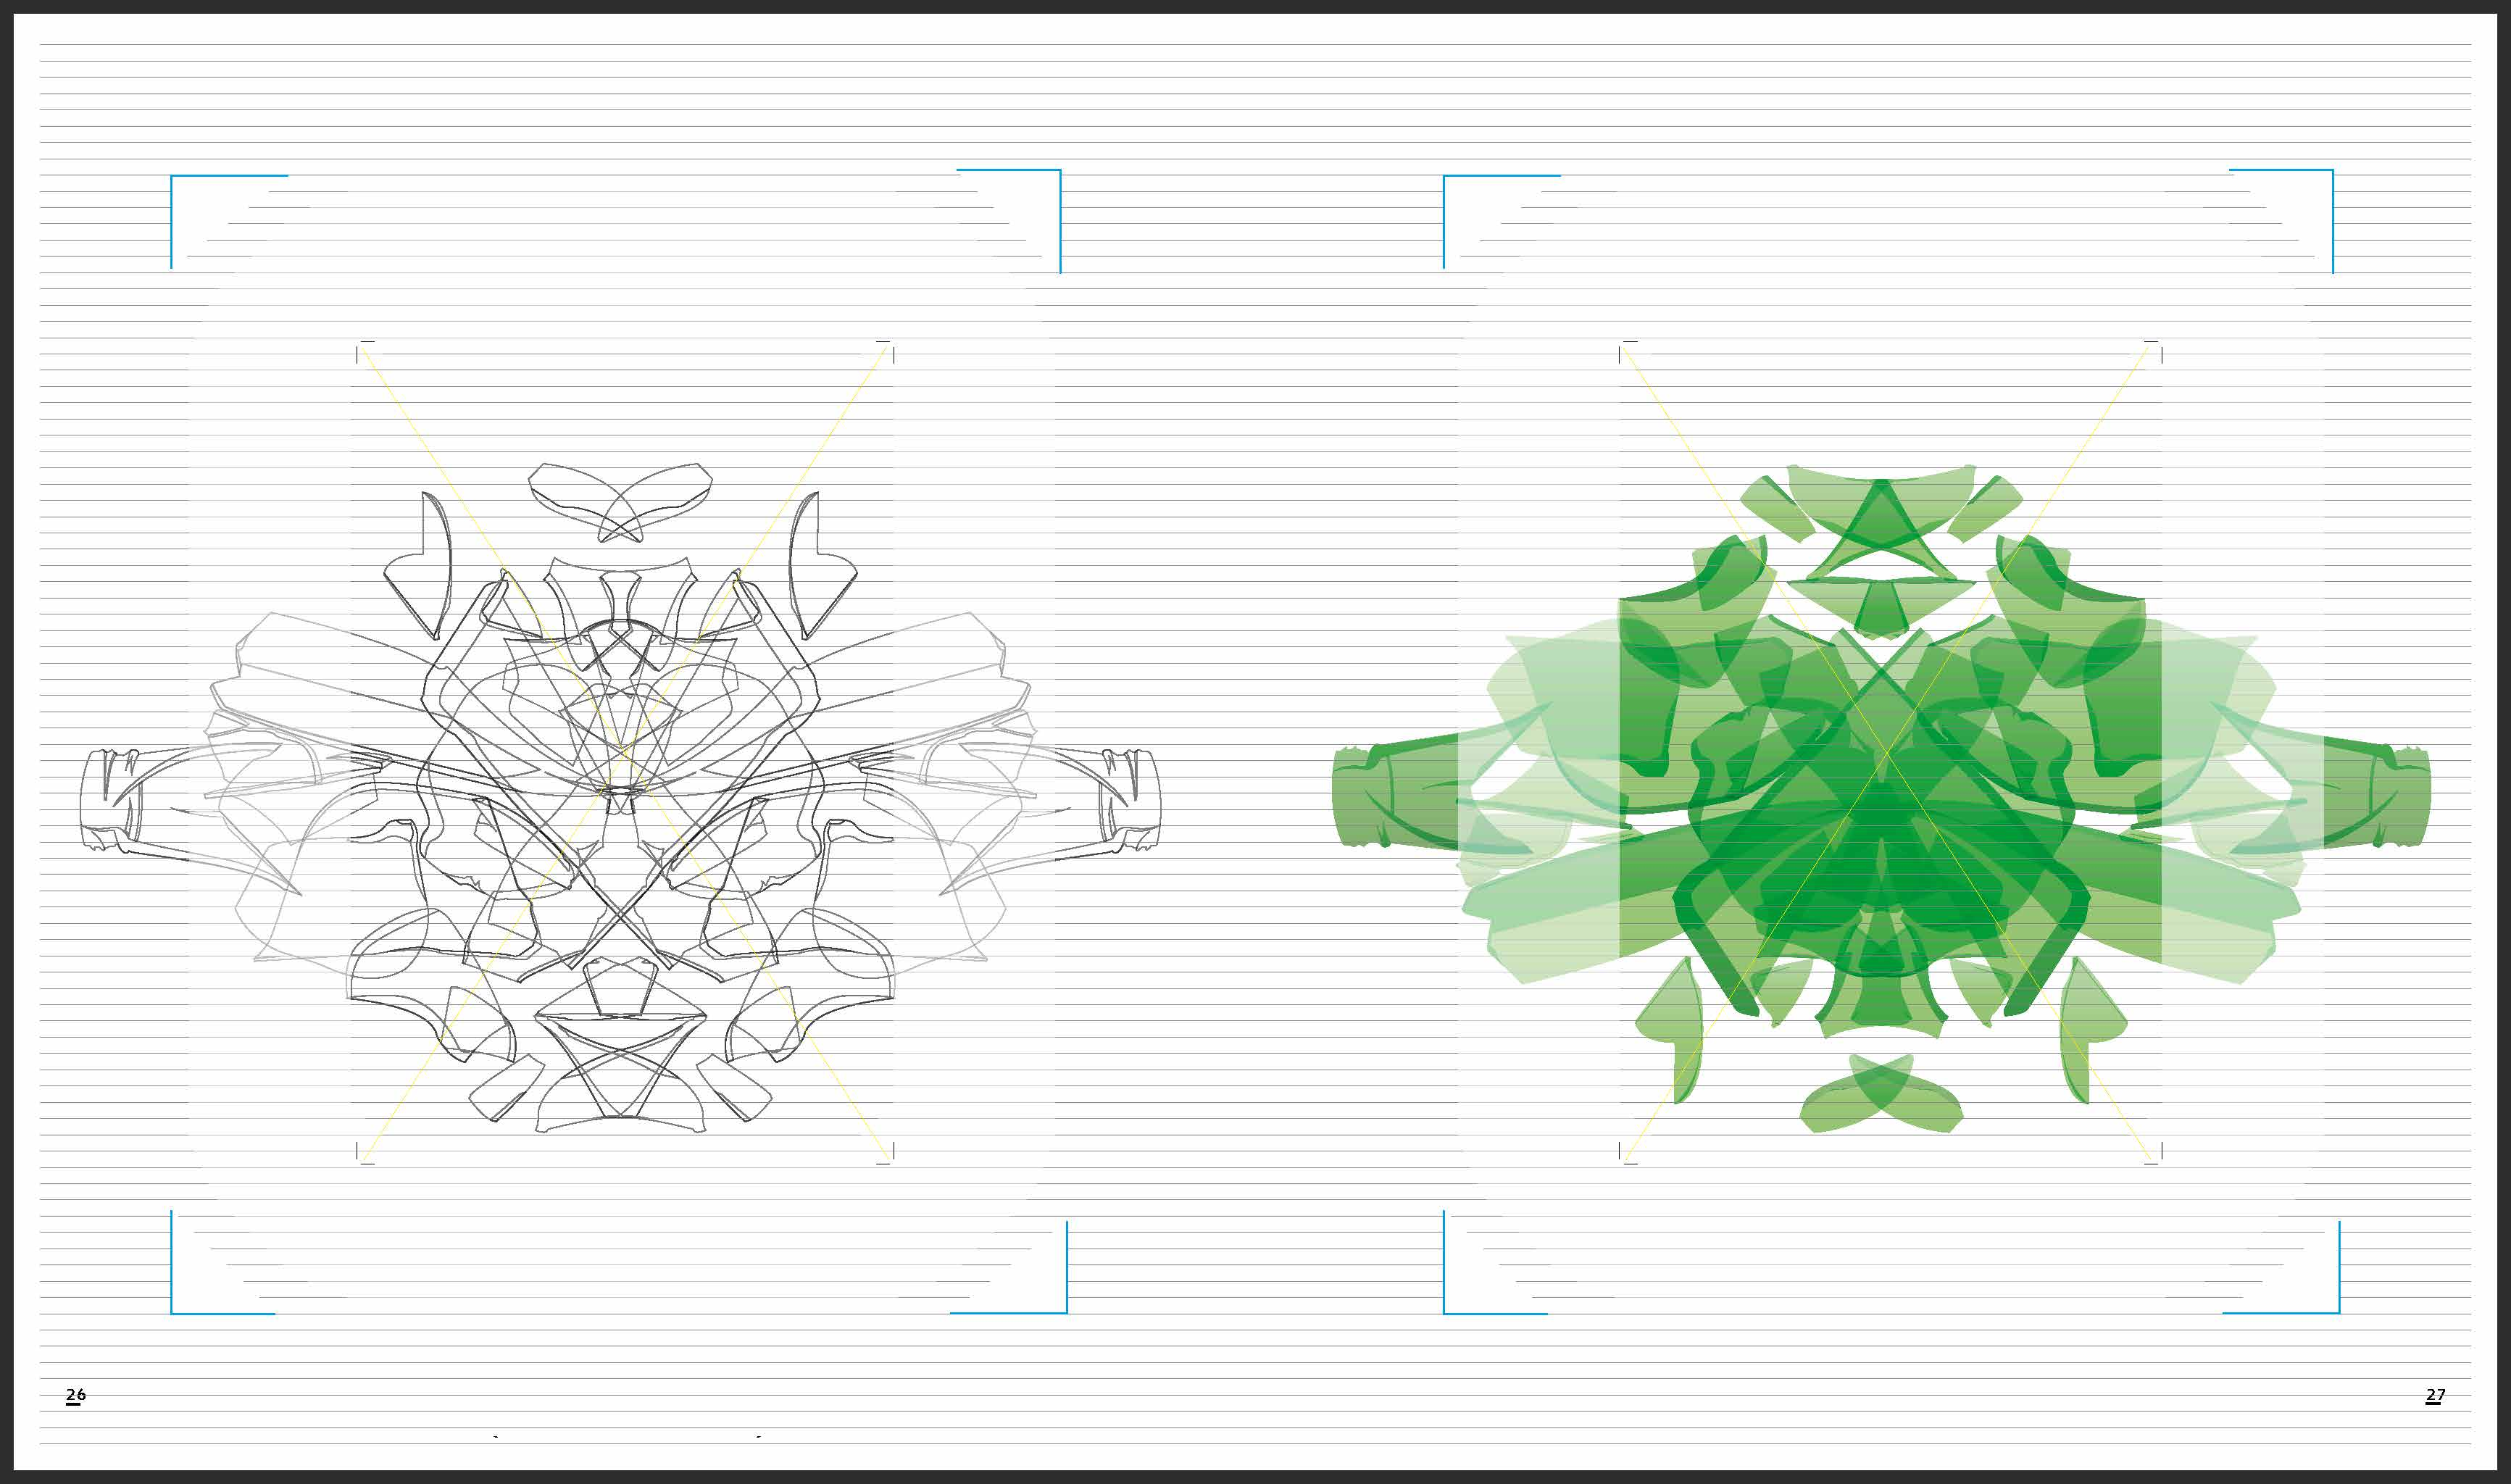 visual_recycling_druckboegen_Seite_014